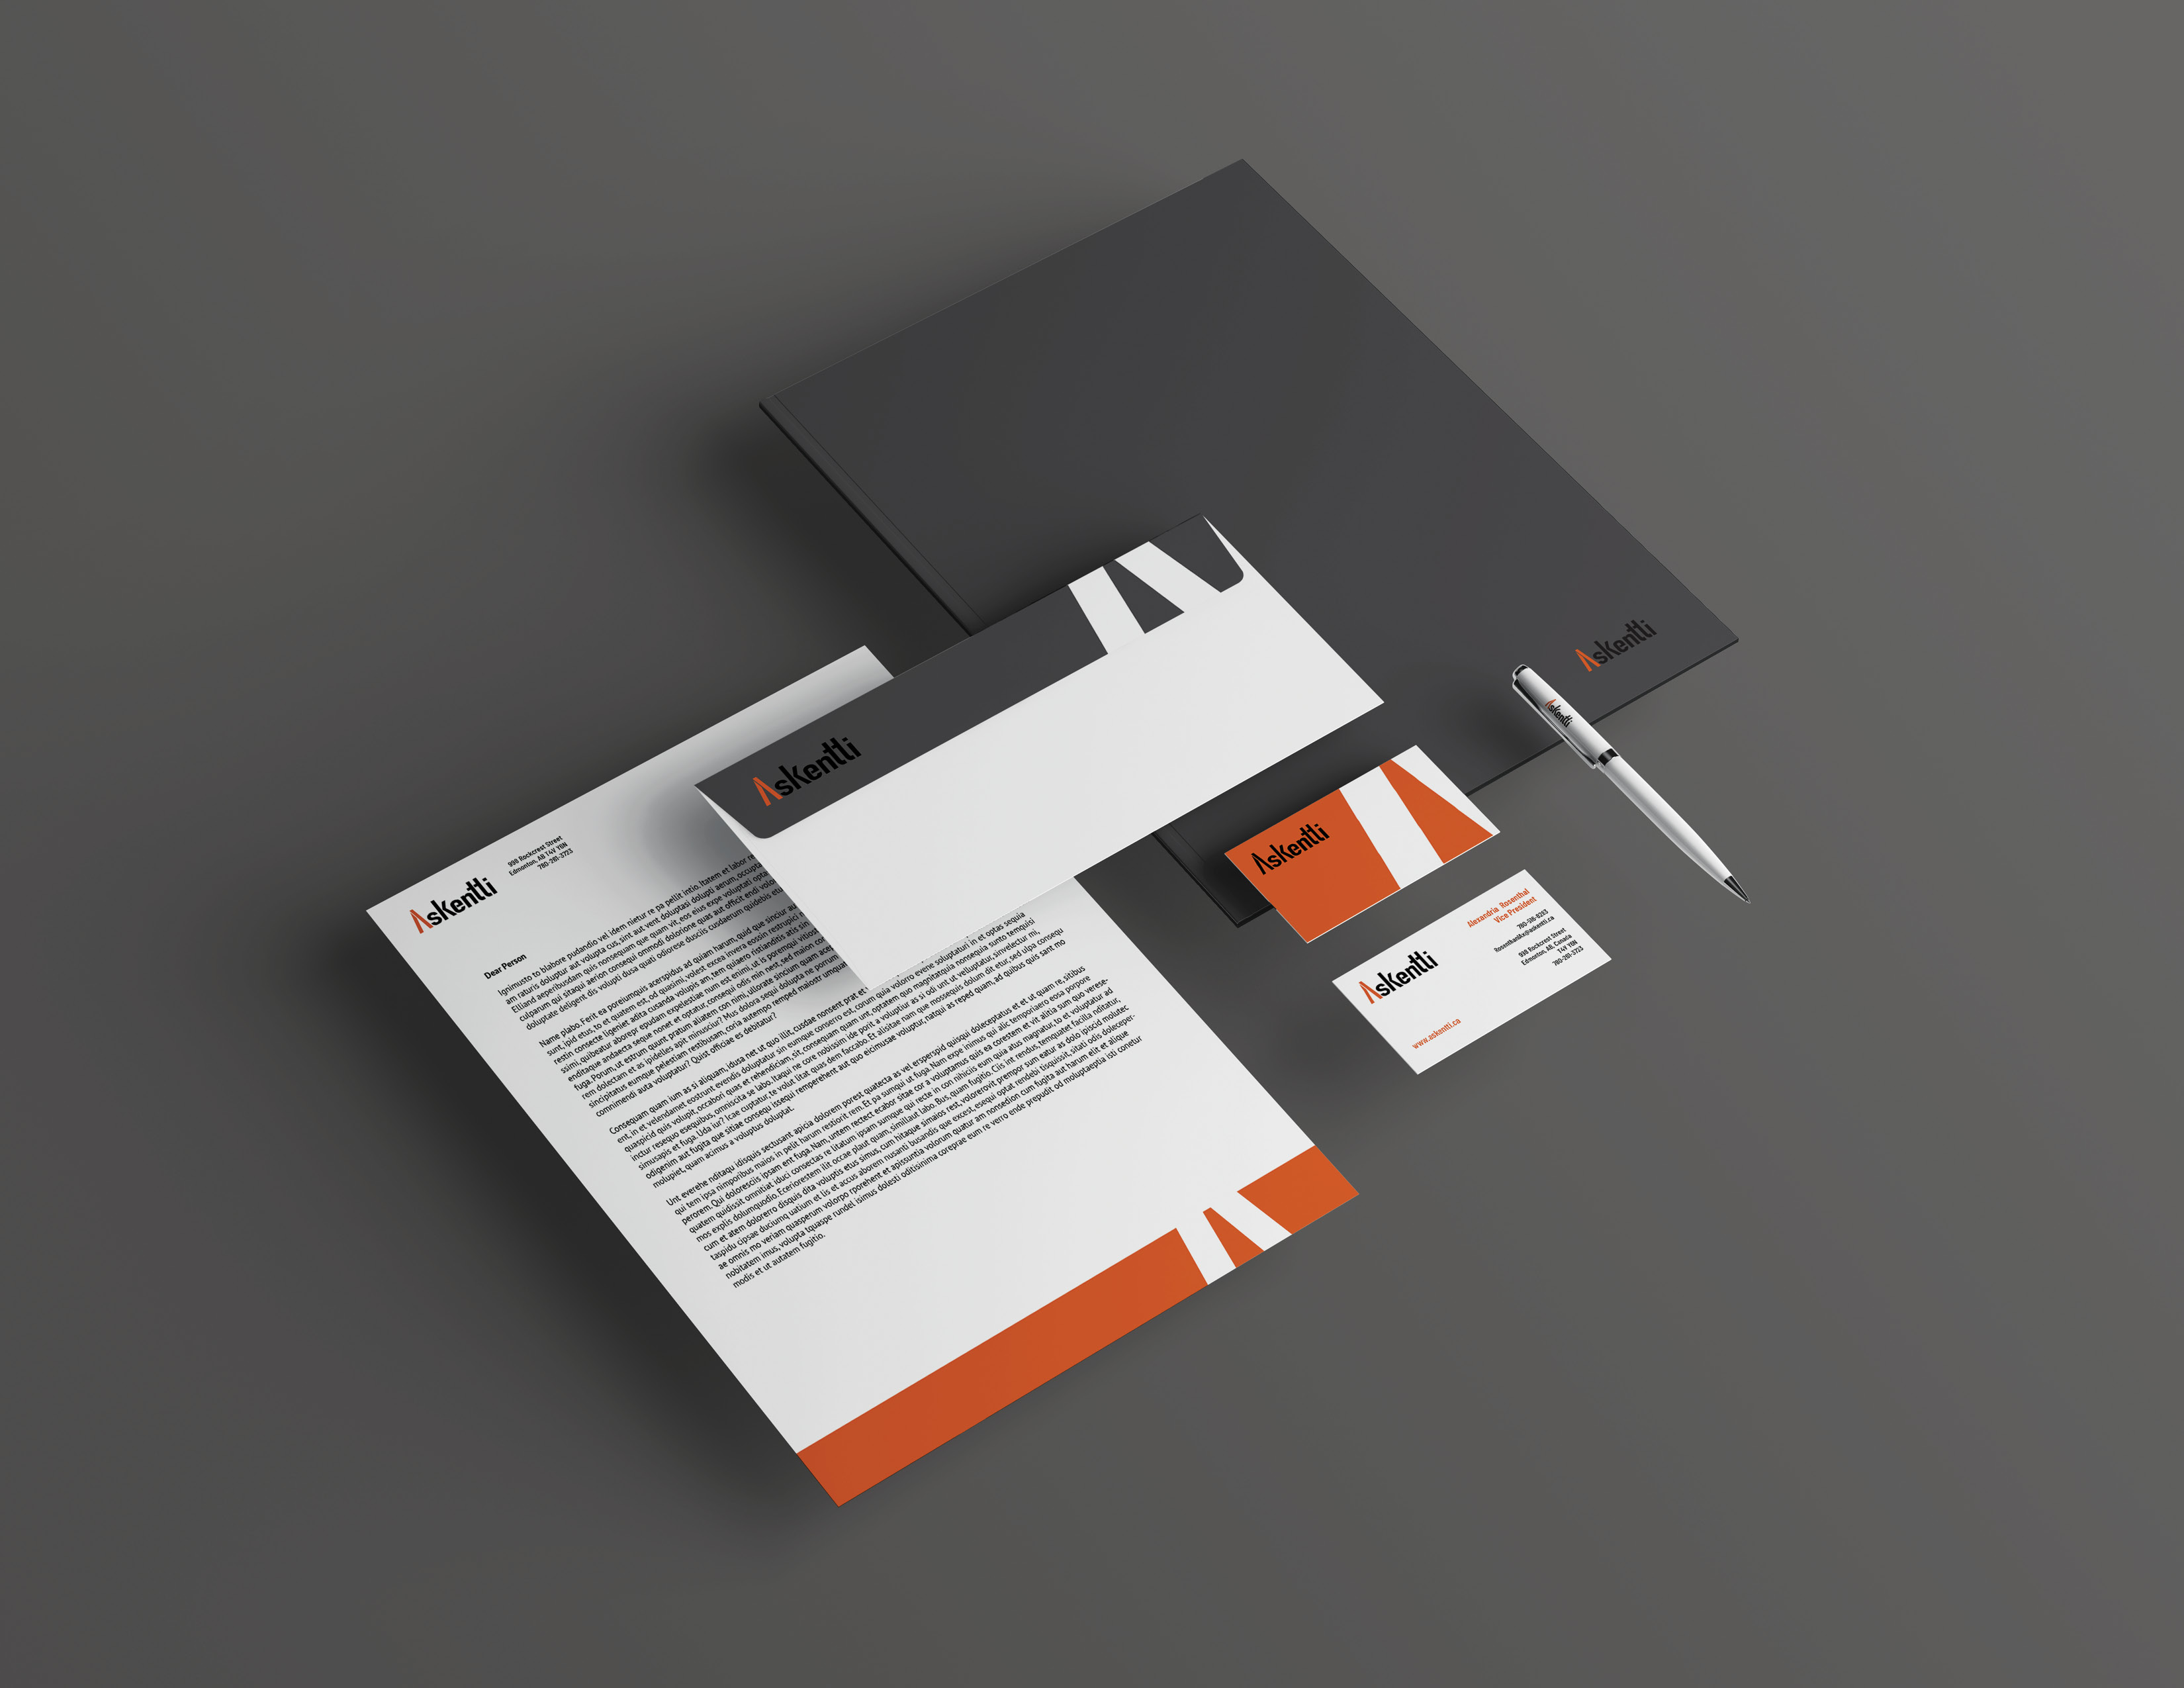 Askentti Stationary materials